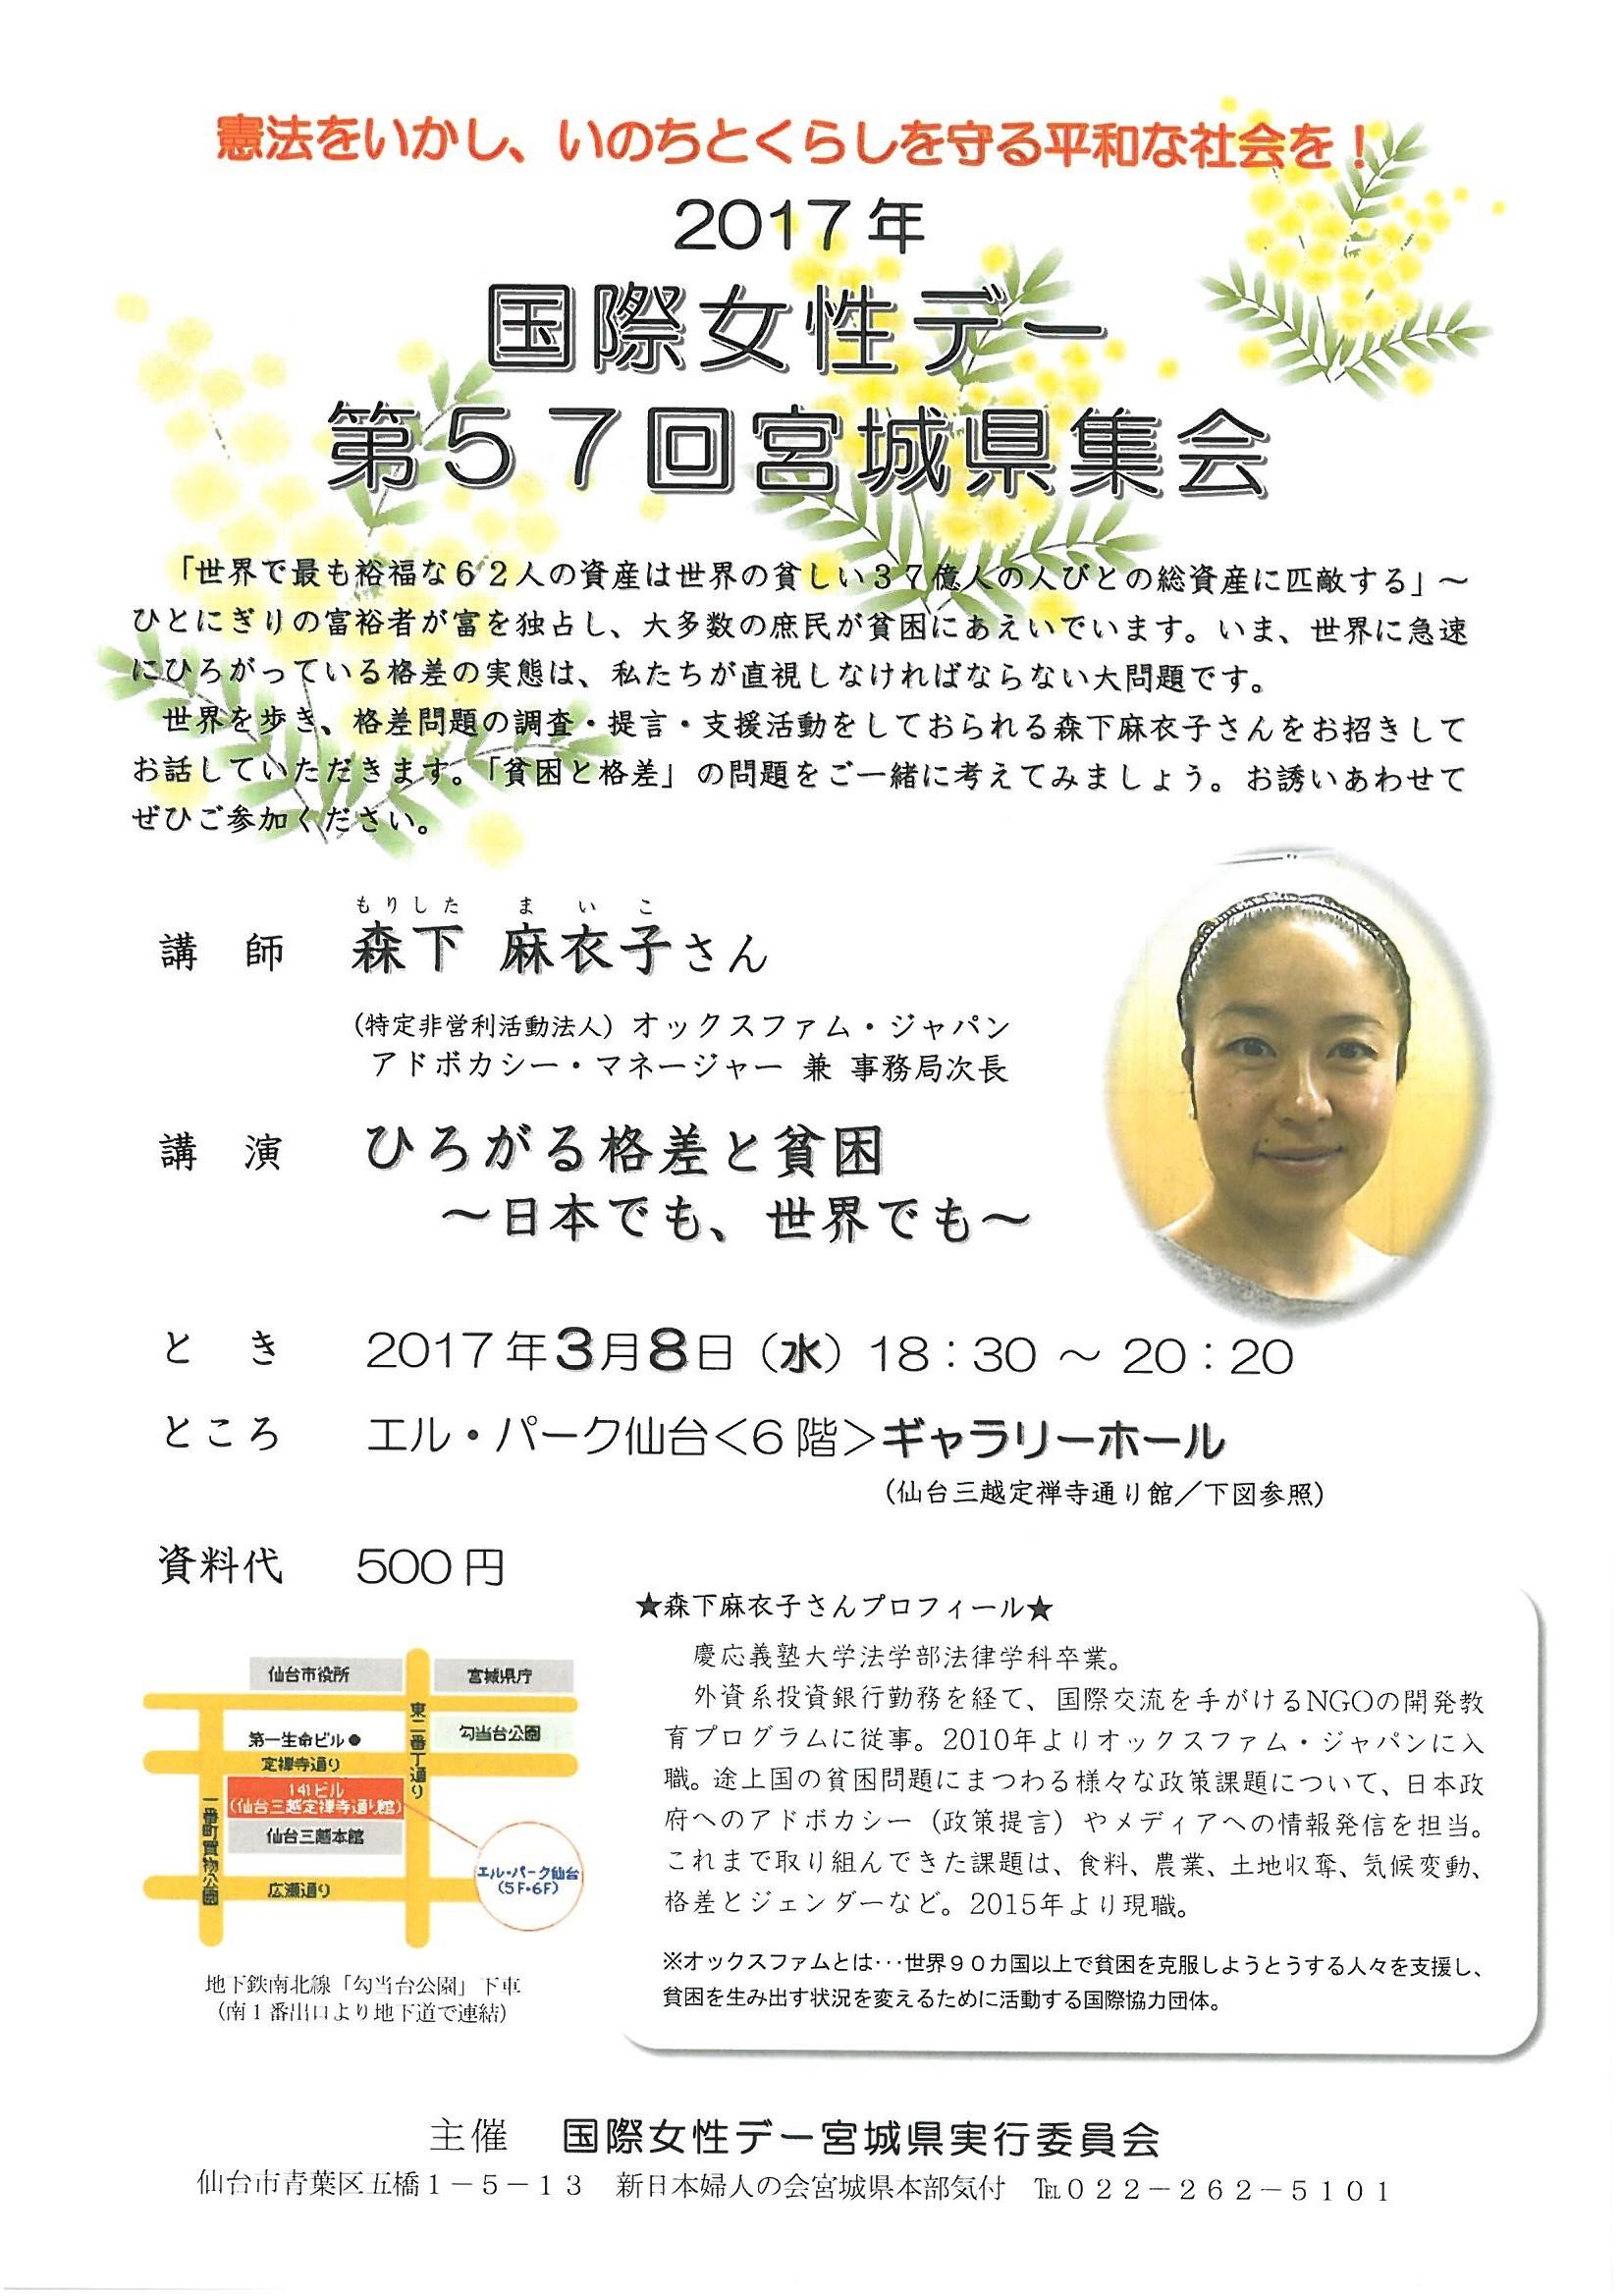 SKMBT_C22017021011540_0003.jpg